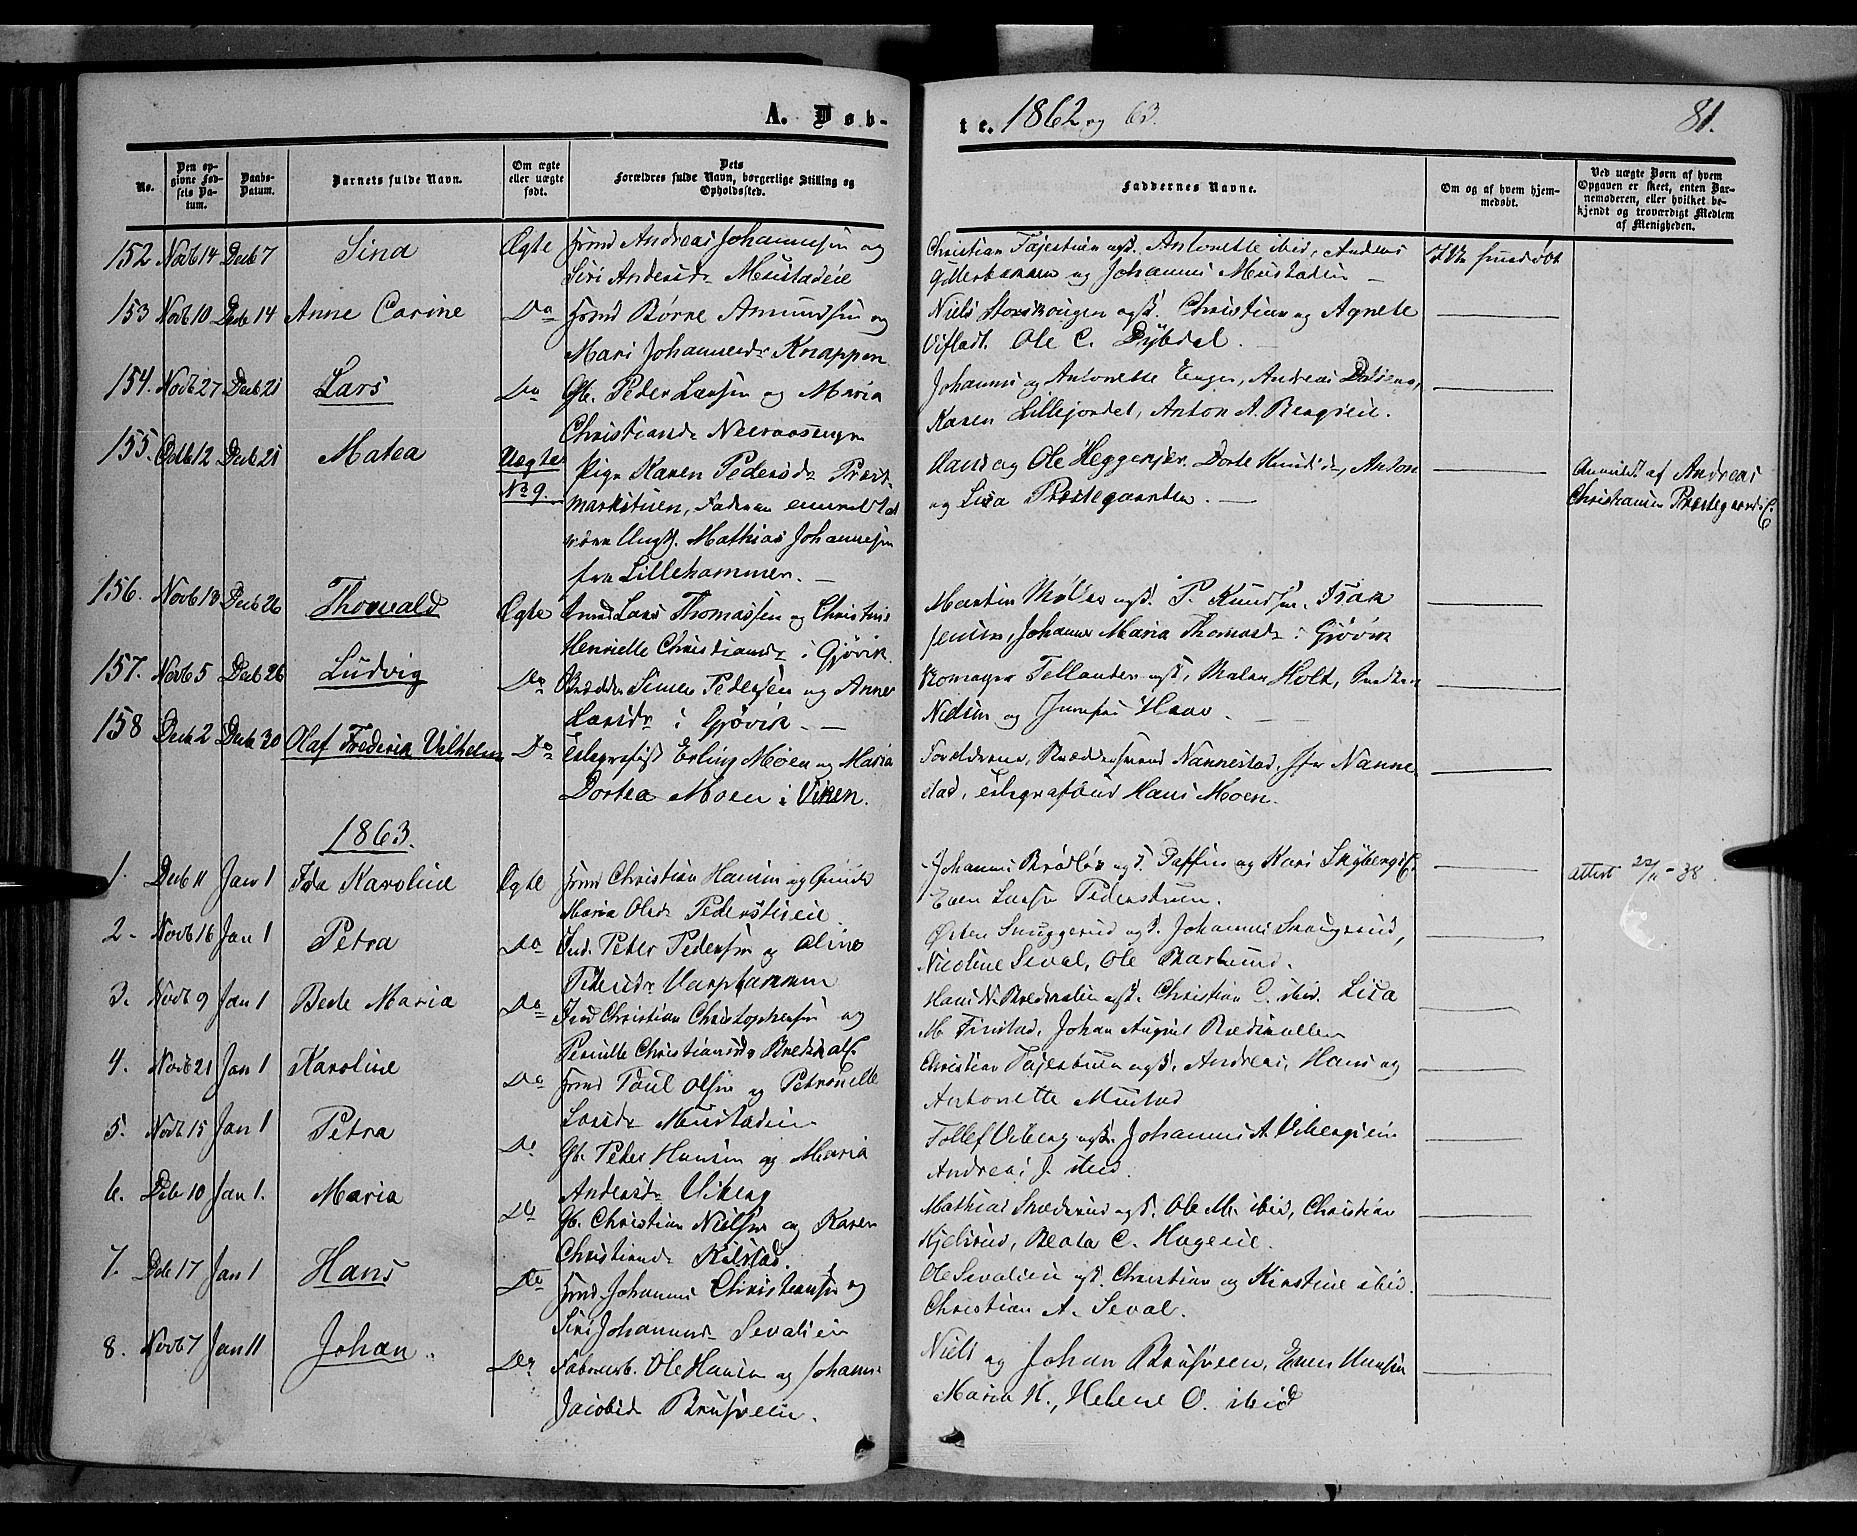 SAH, Vardal prestekontor, H/Ha/Haa/L0006: Ministerialbok nr. 6, 1854-1866, s. 81